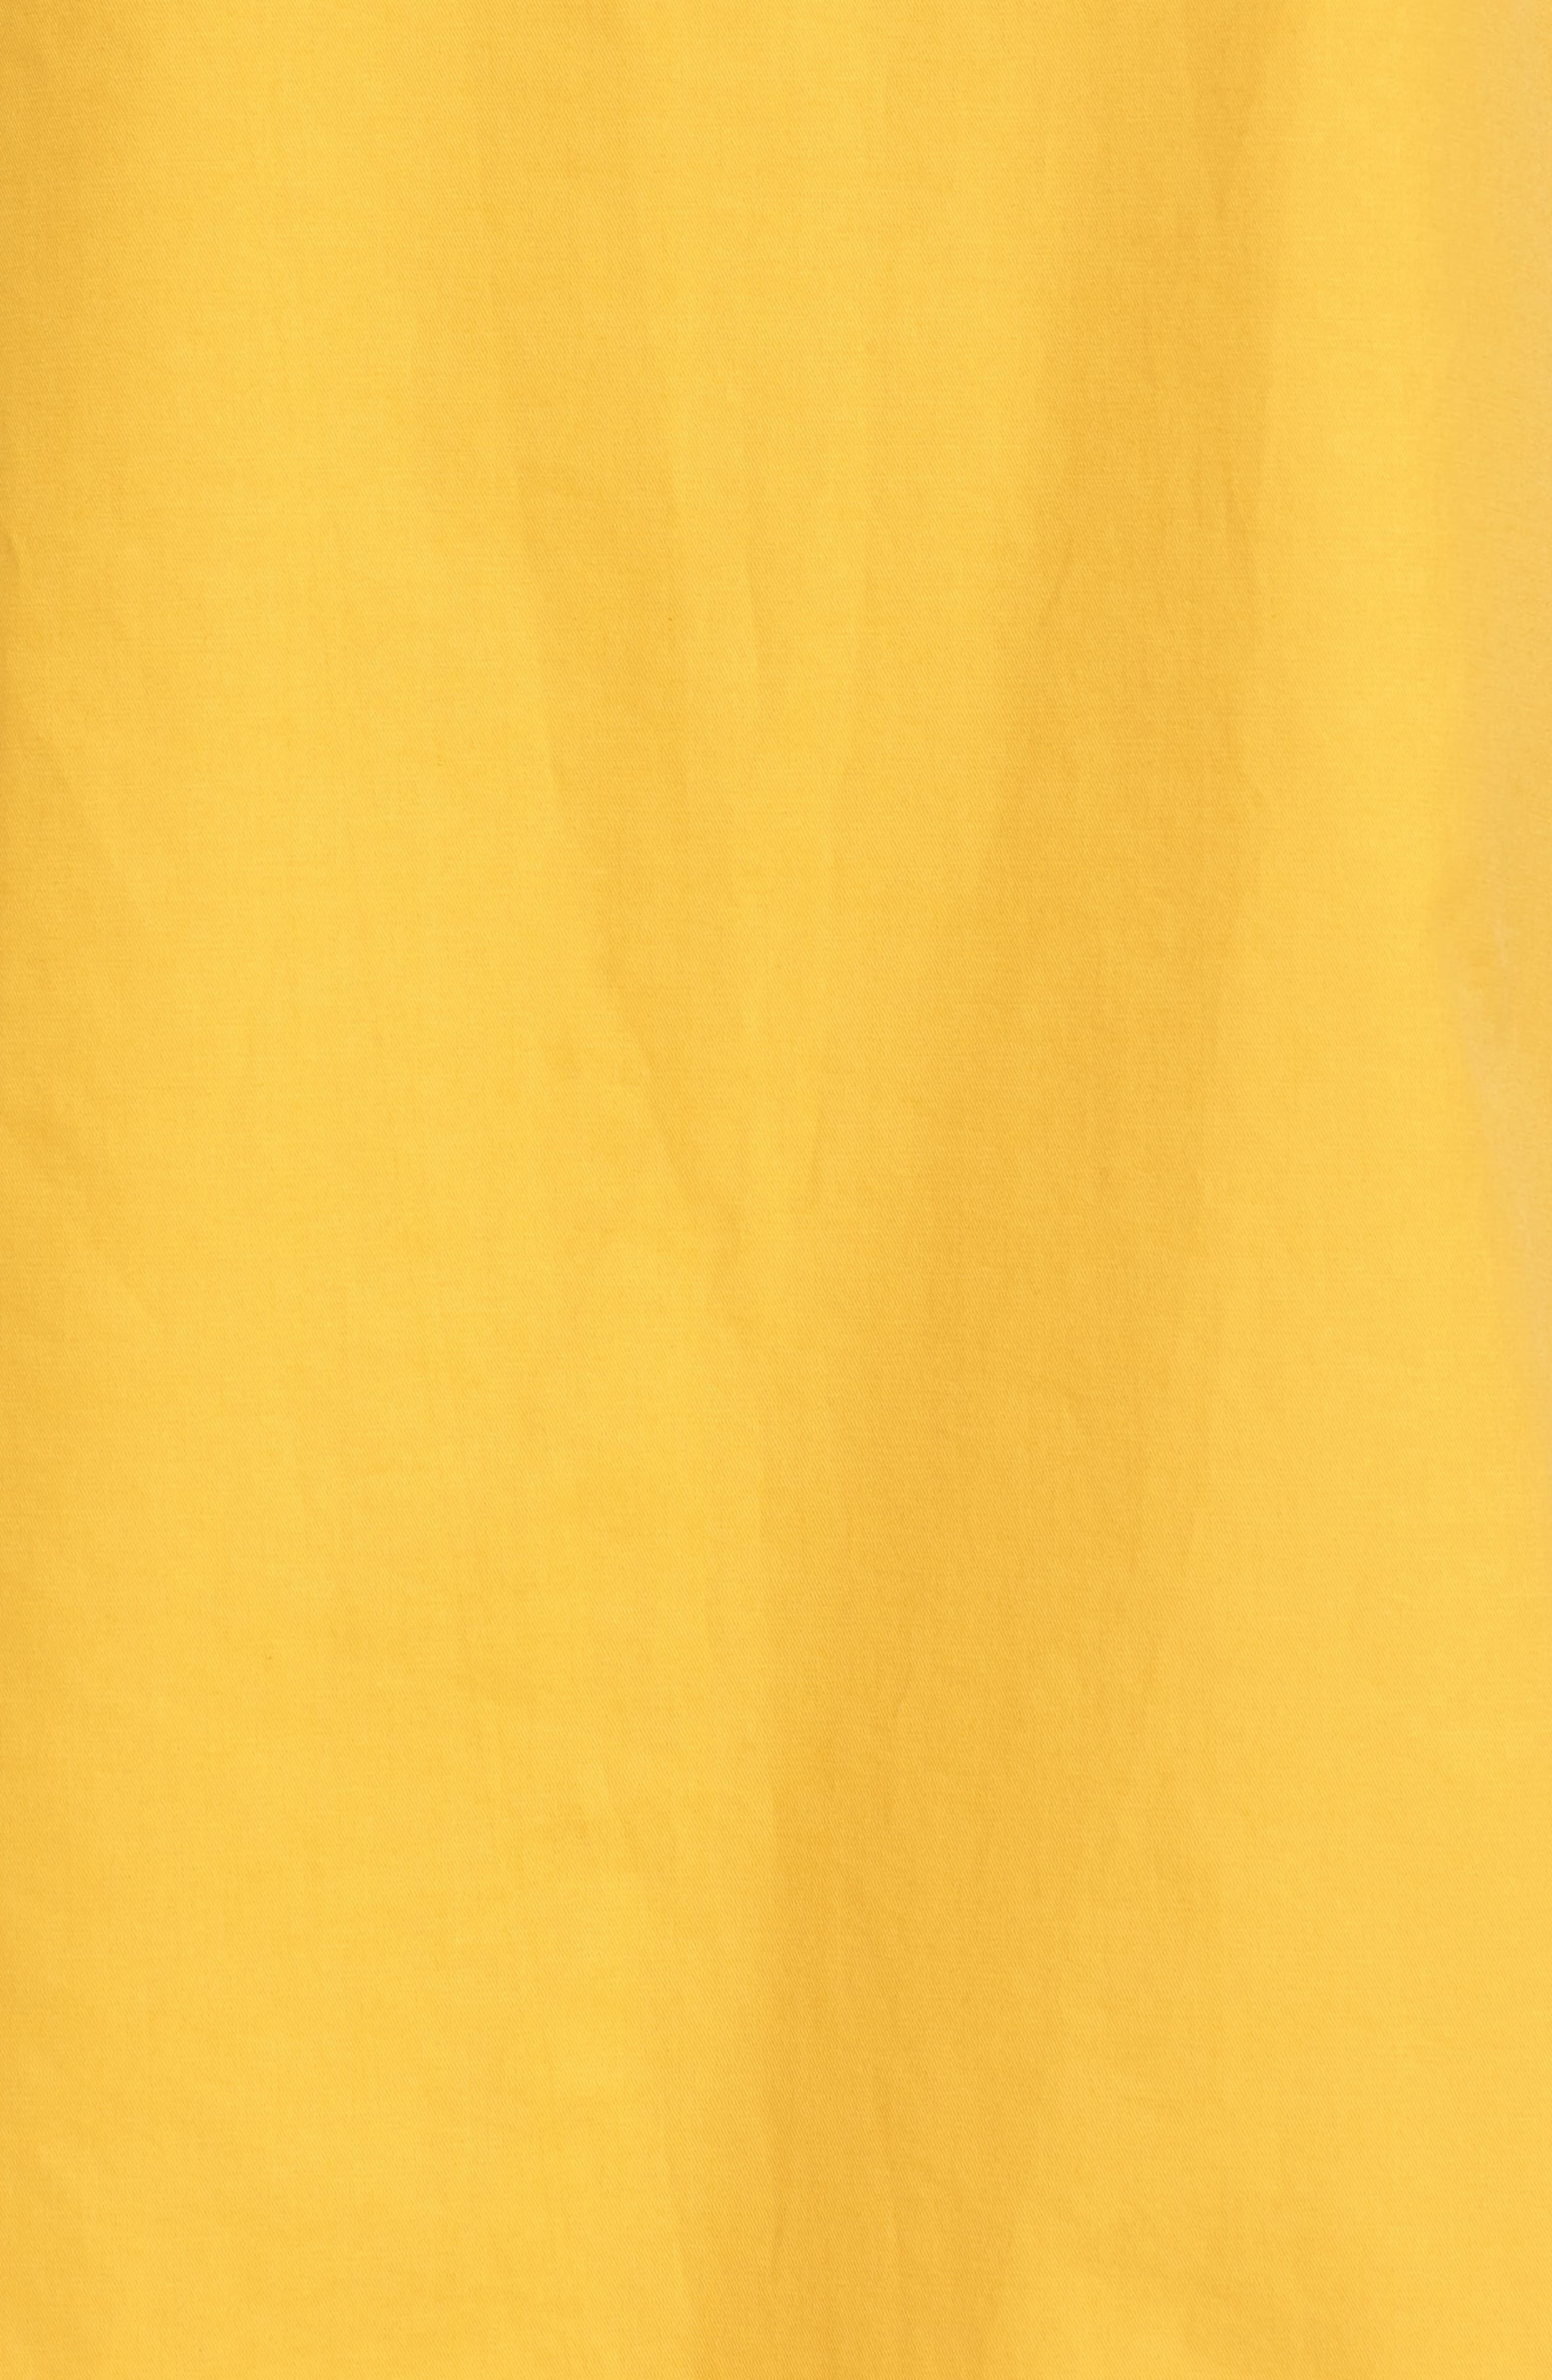 Parachute Sleeve Shift Dress,                             Alternate thumbnail 5, color,                             Yellow Mineral